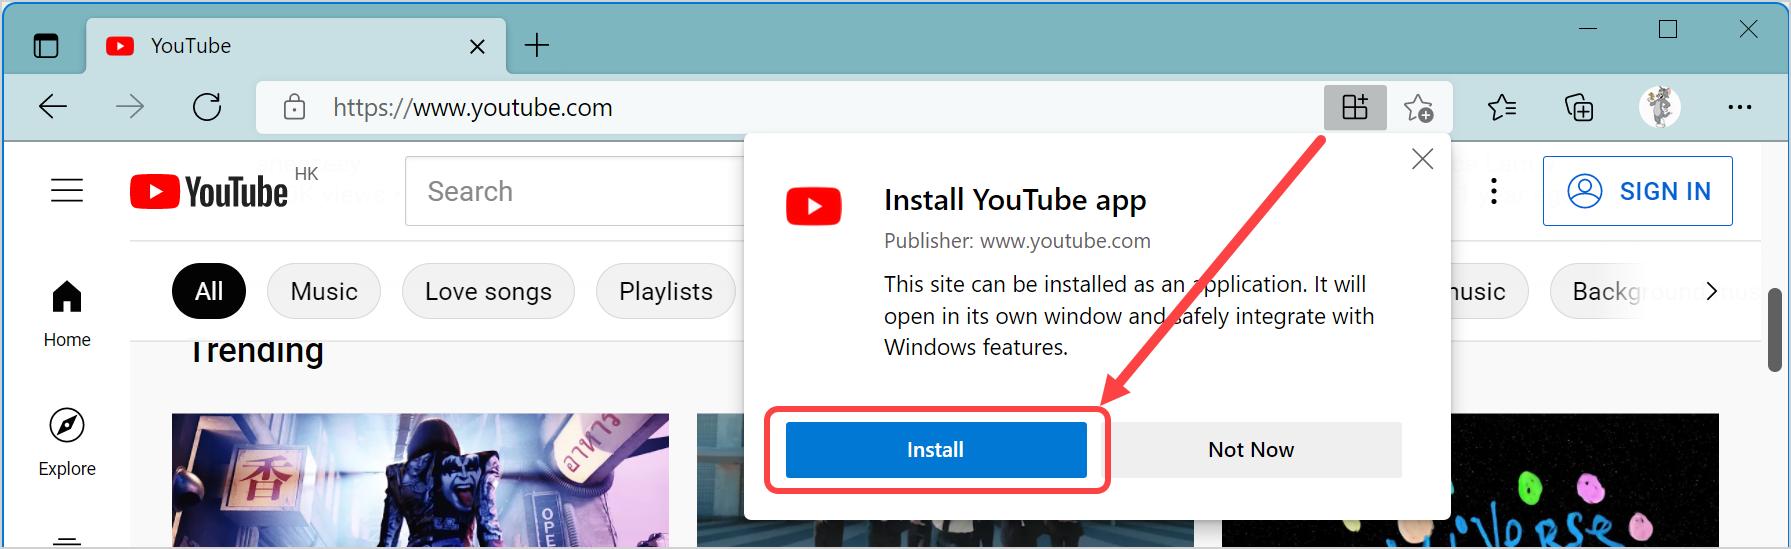 Install YouTube App in Windows 11